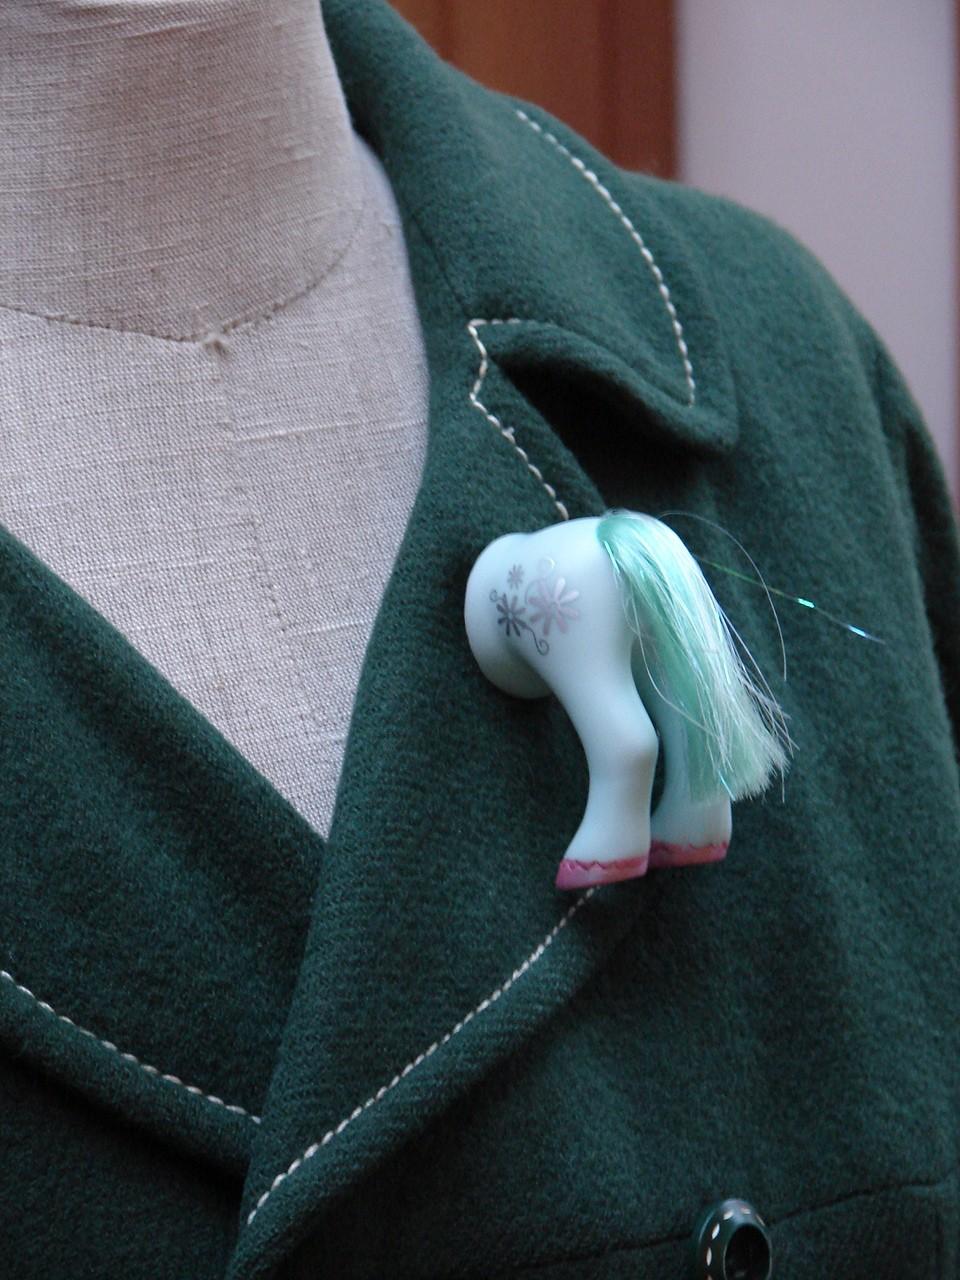 My Little Pony Butt Brooch